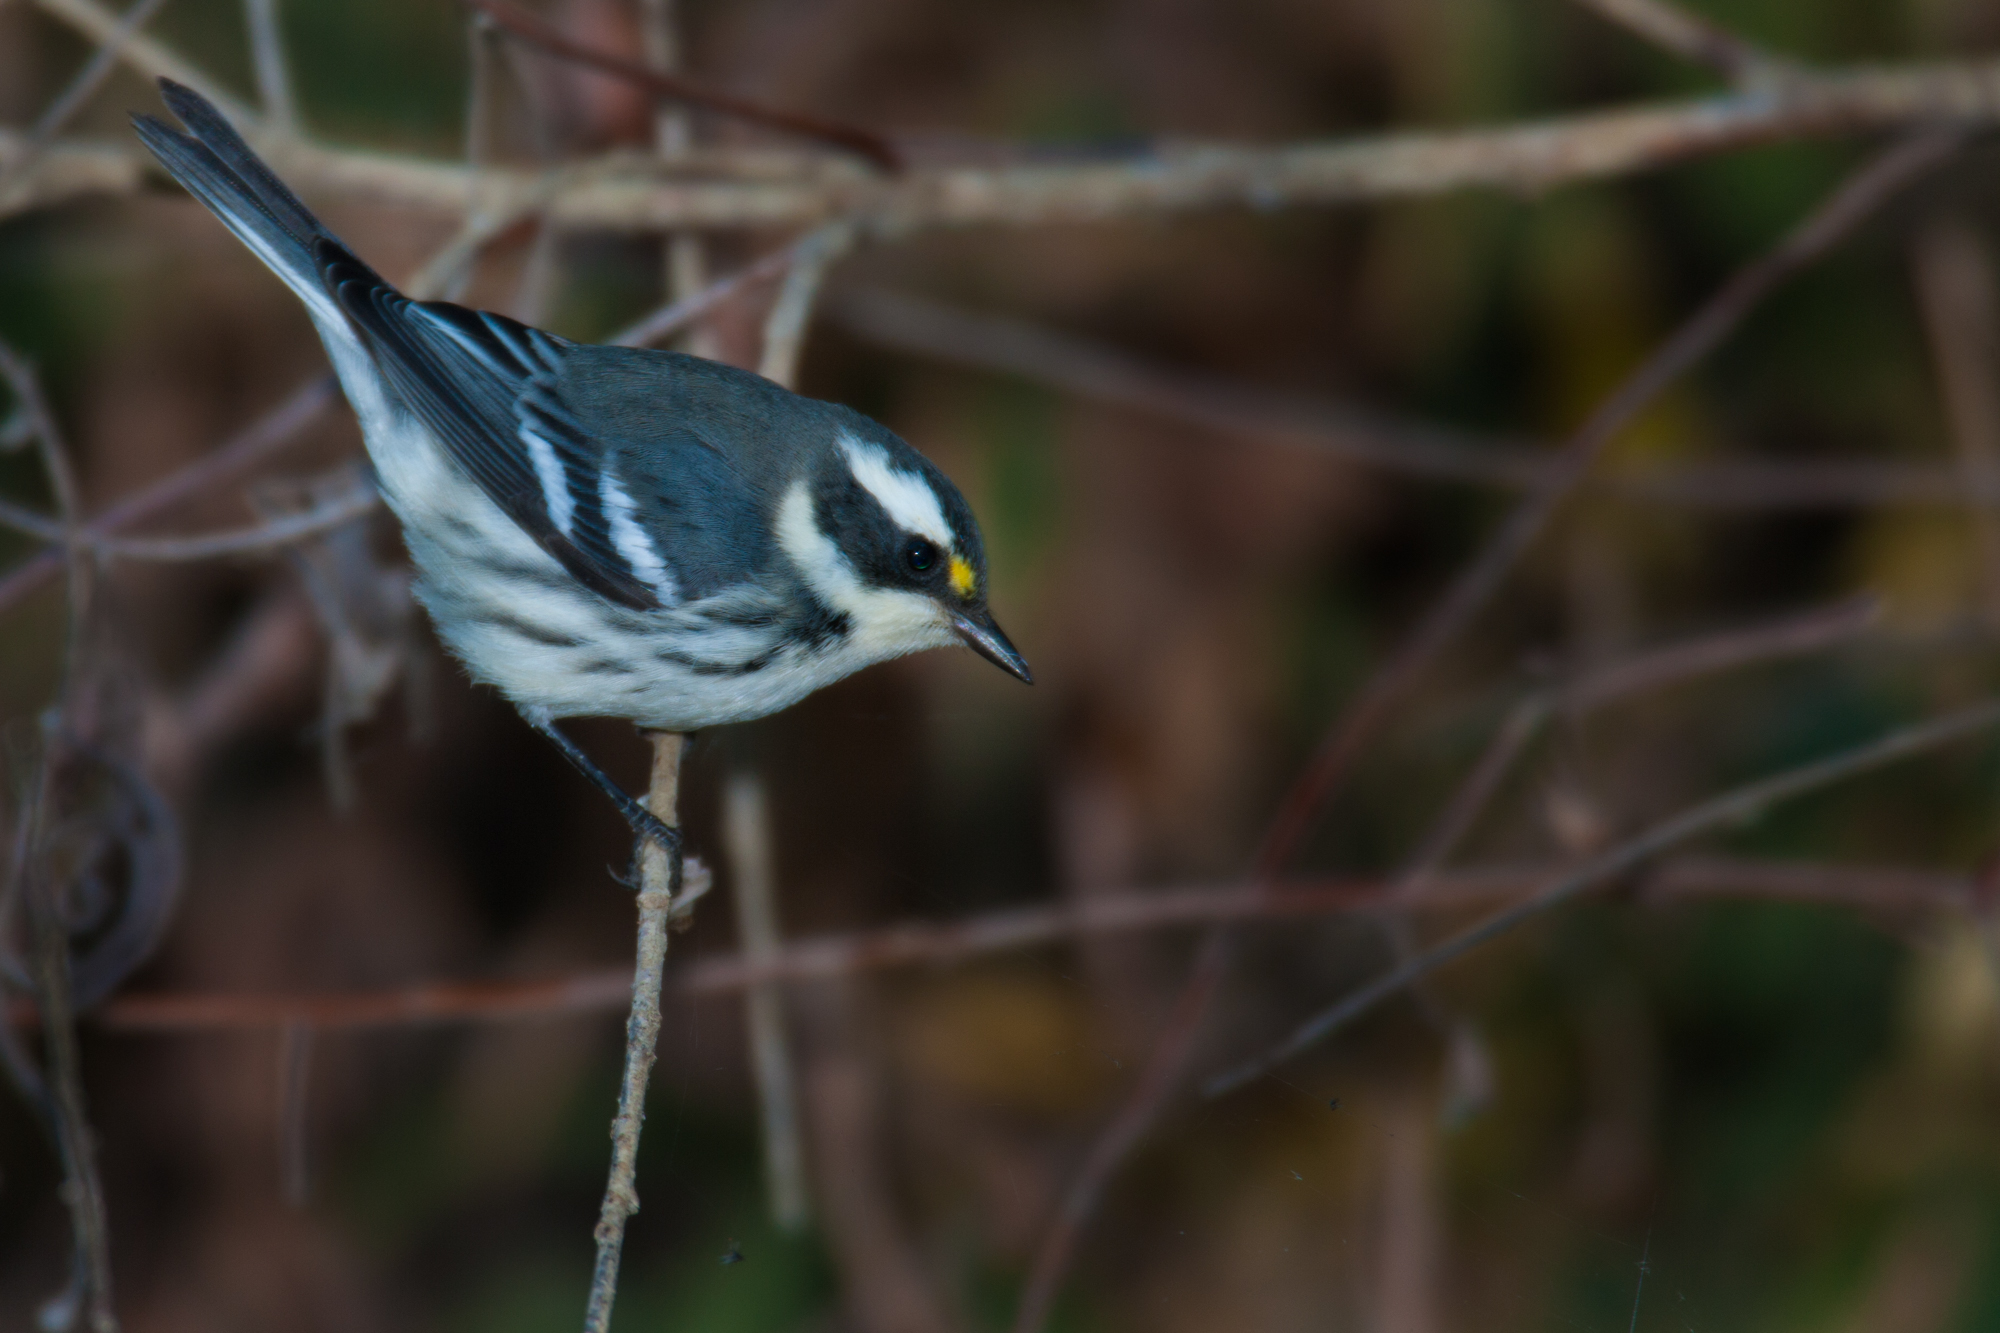 Black-throated Gray Warbler, male..雄性黑喉灰林莺